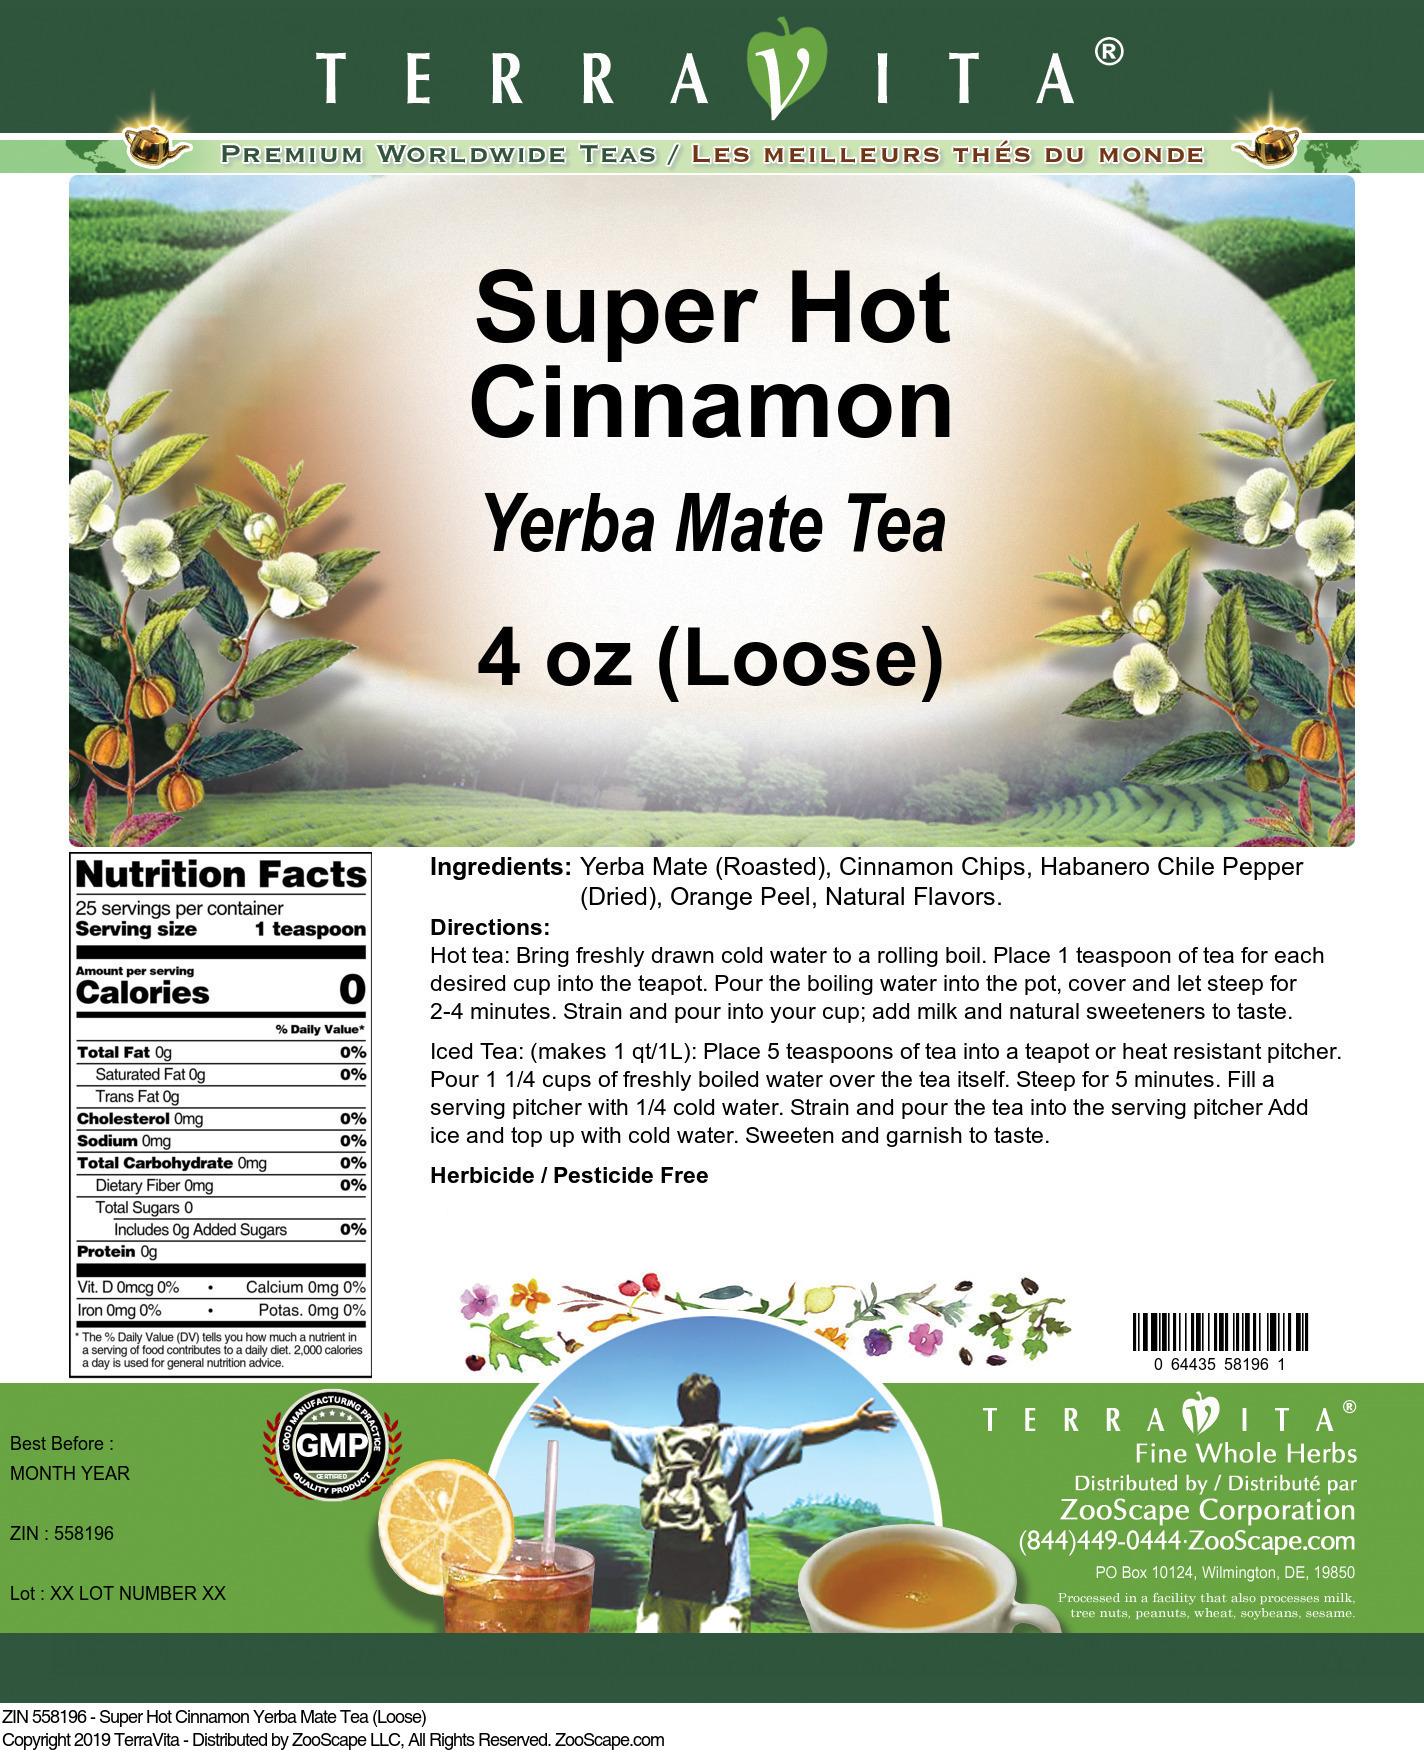 Super Hot Cinnamon Yerba Mate Tea (Loose)